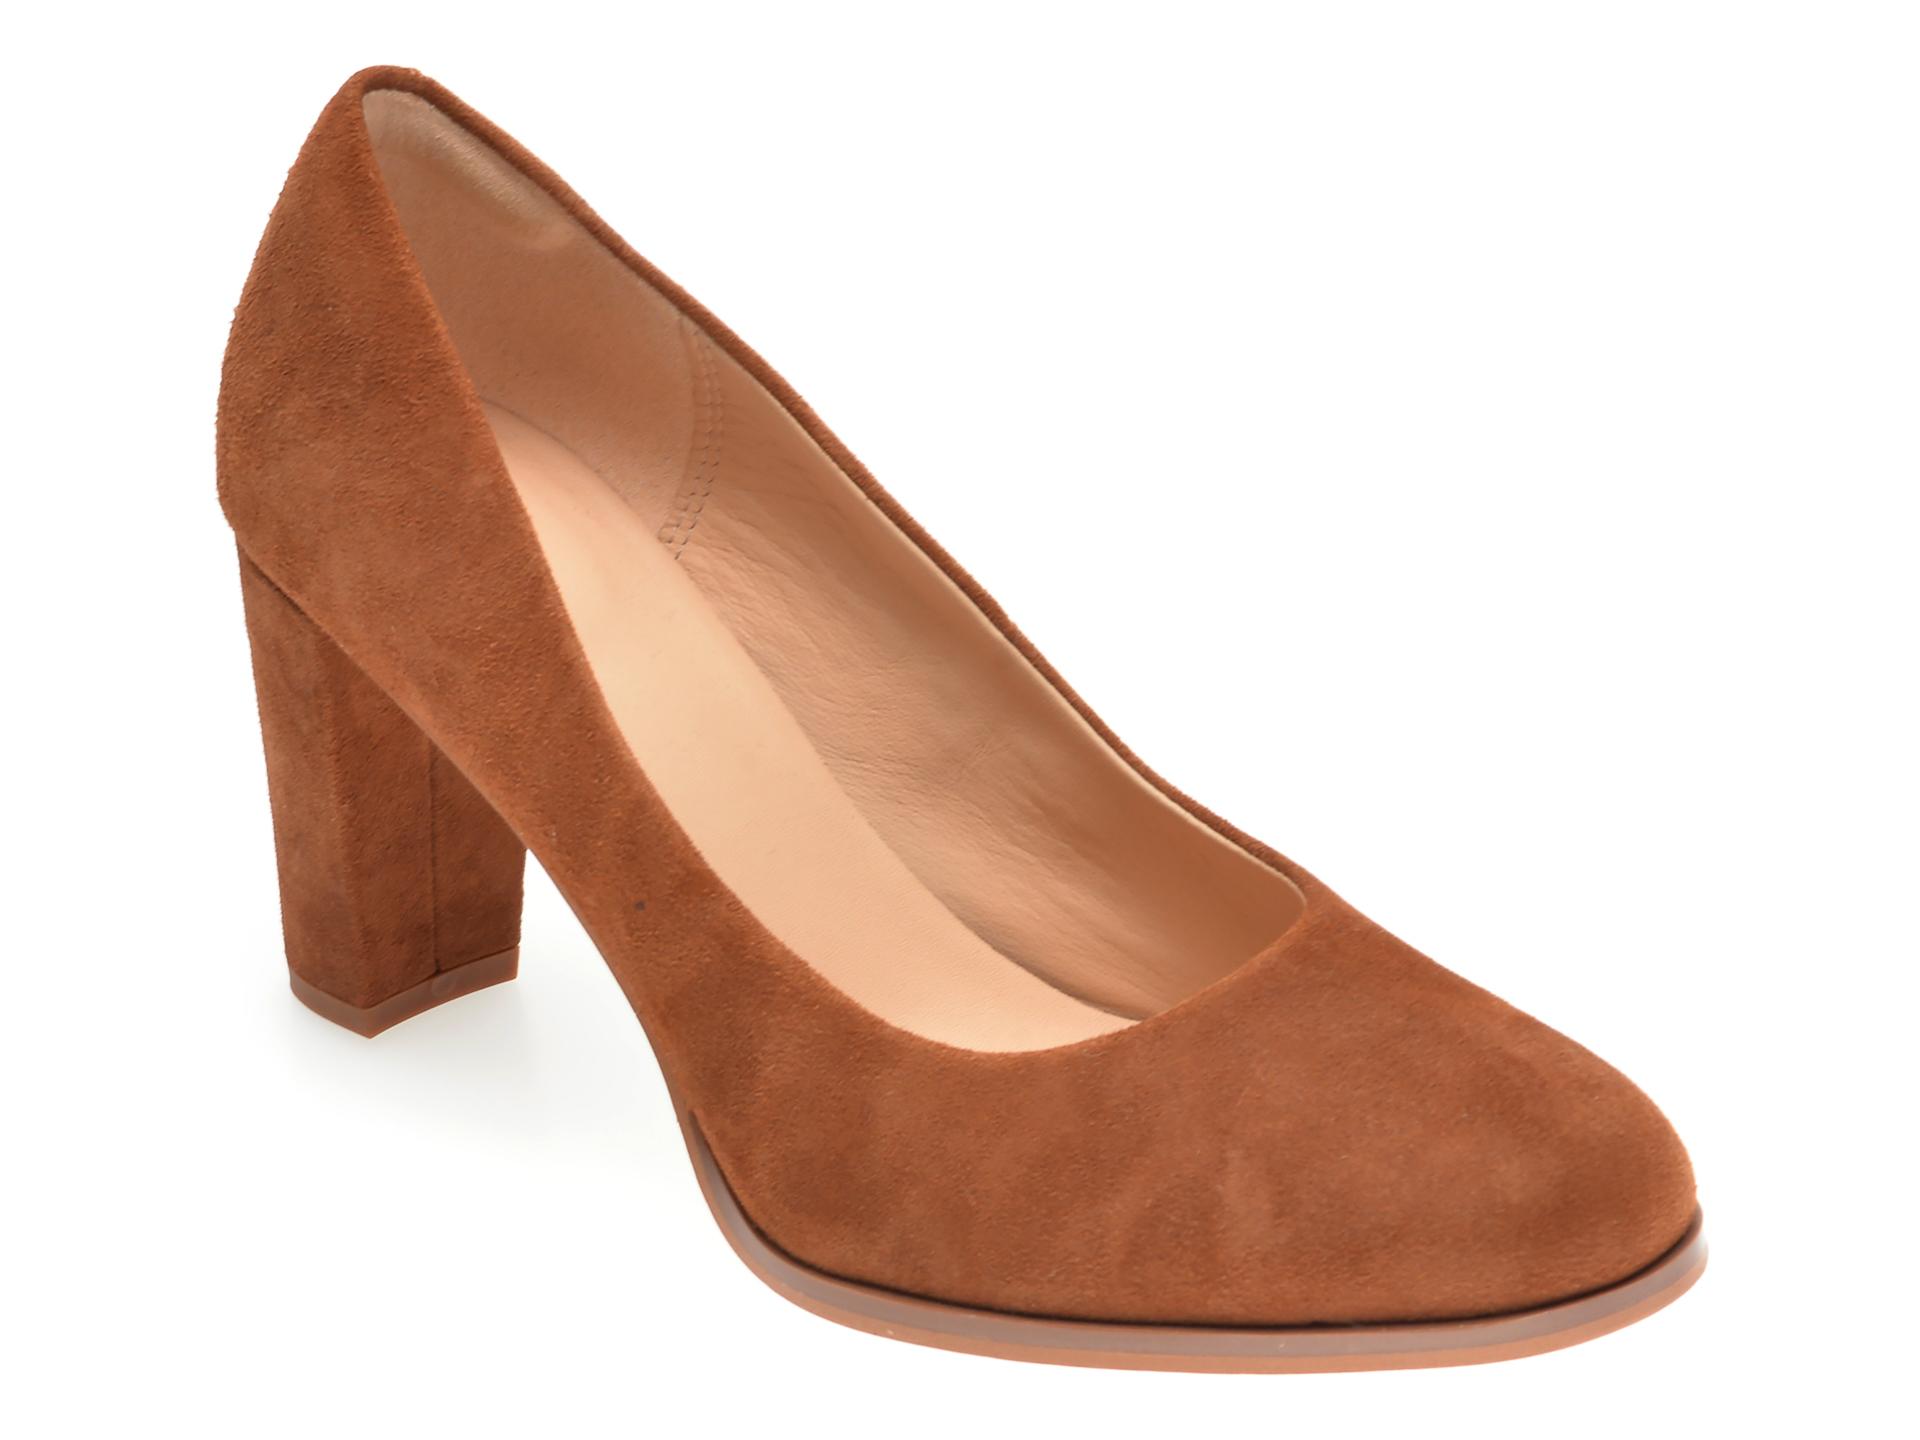 Pantofi CLARKS maro, KAYLIN CARA, din piele intoarsa imagine